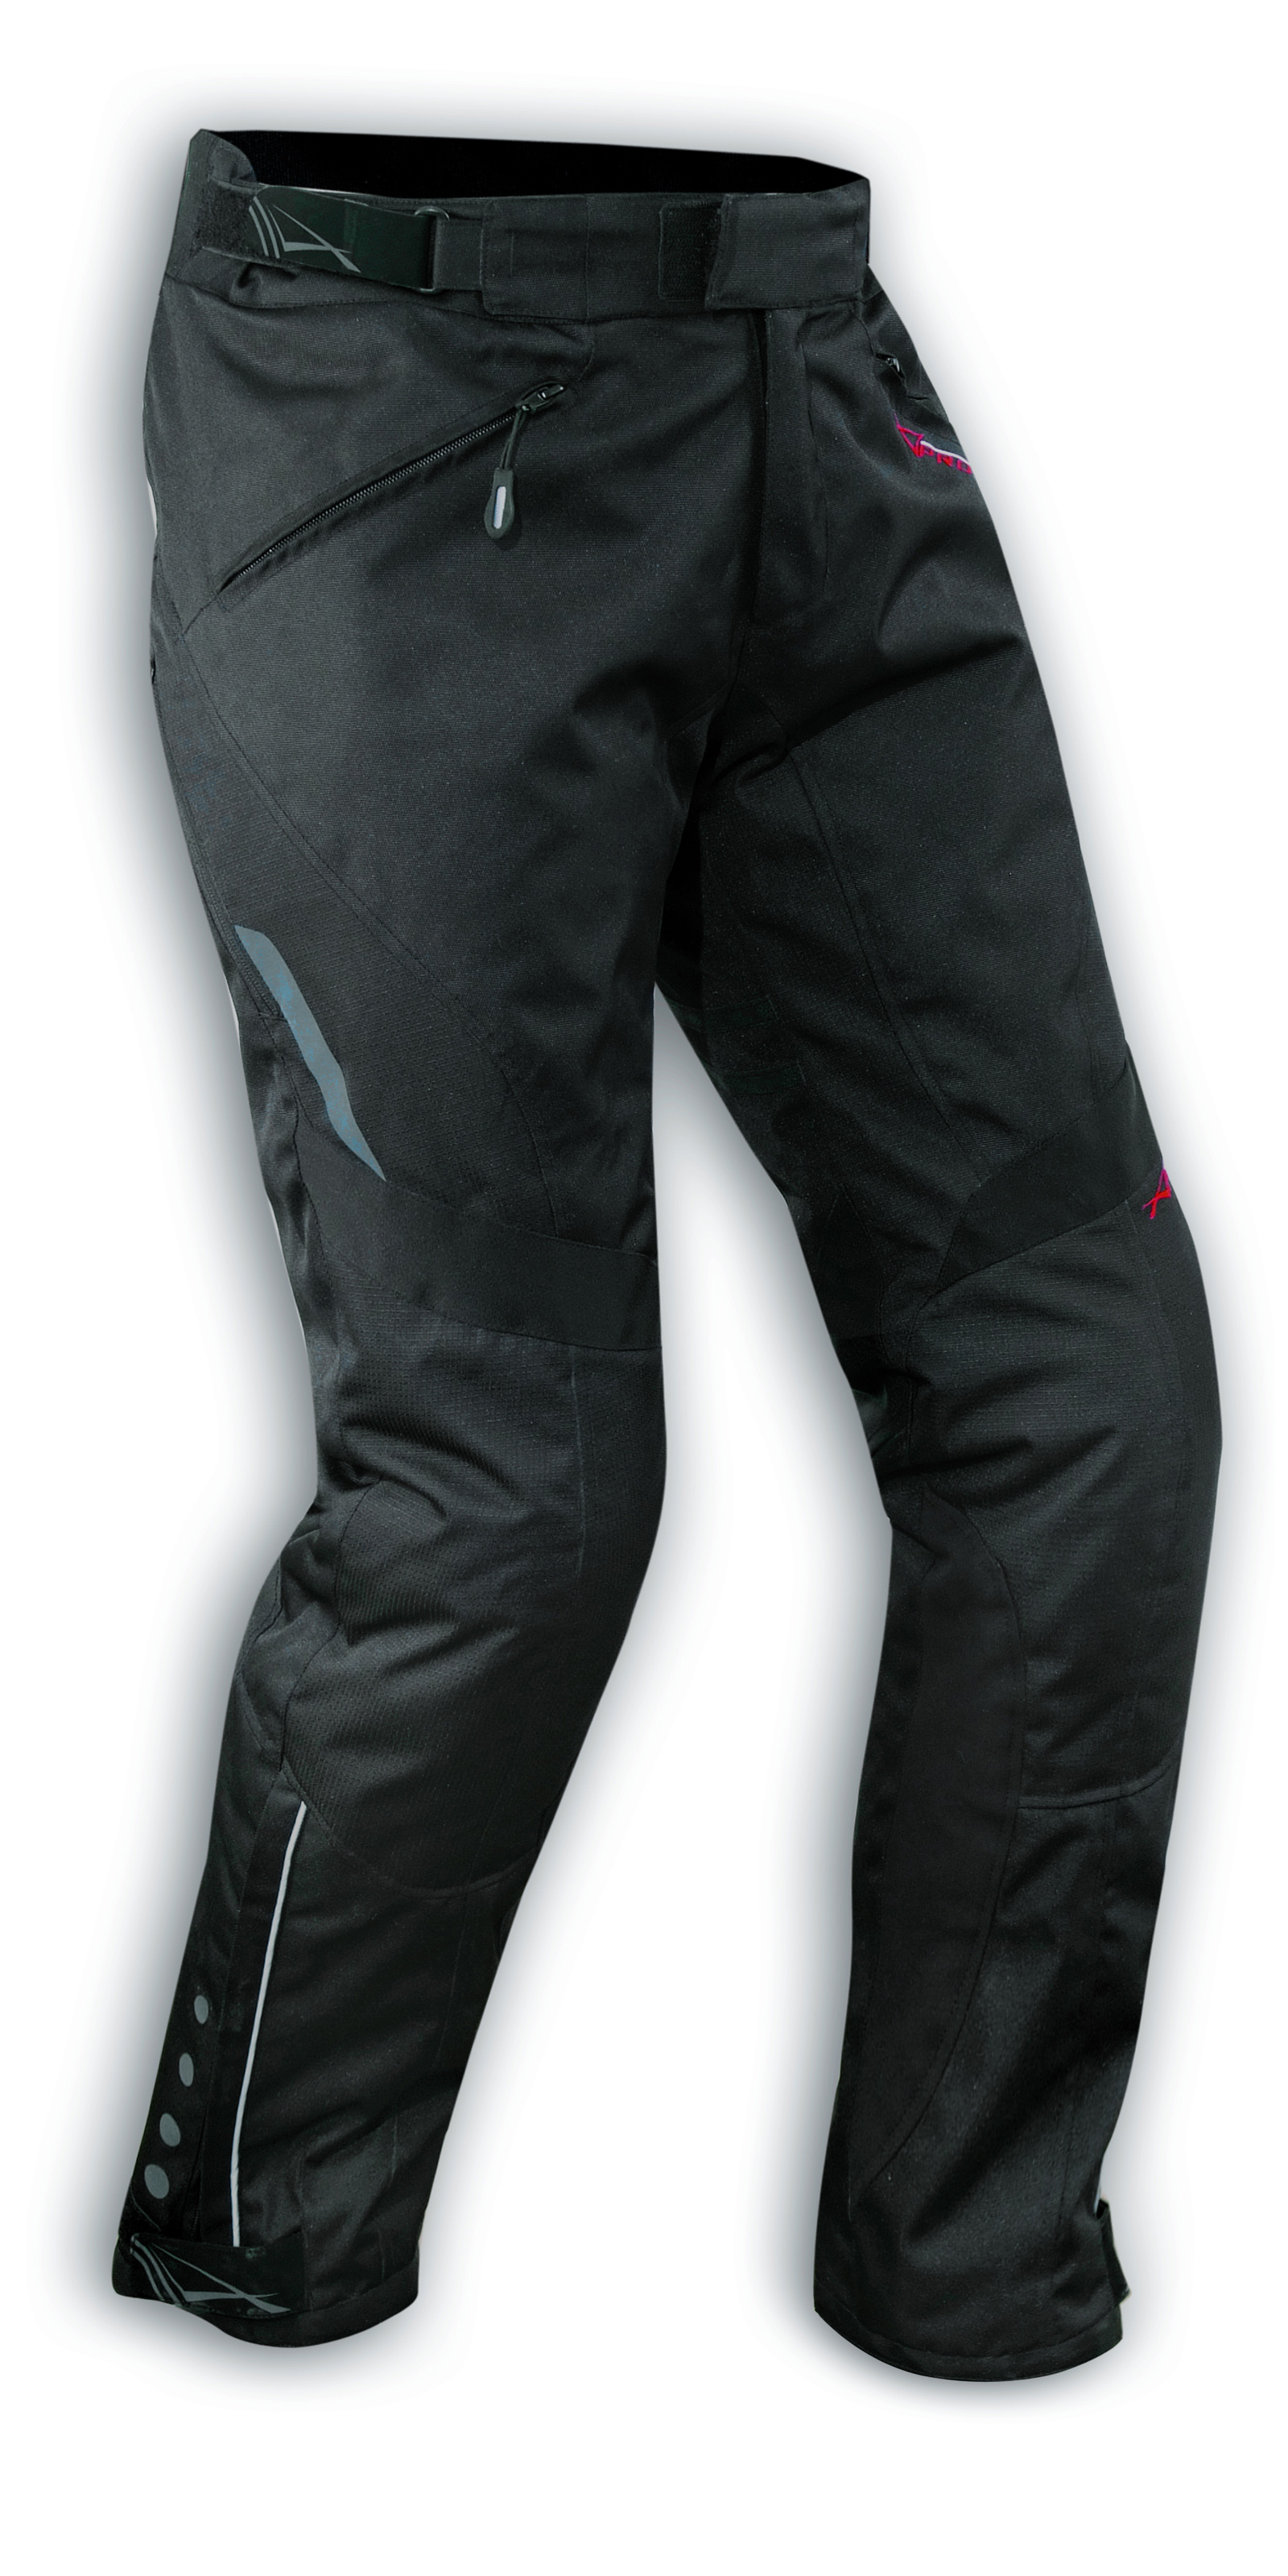 Pantalones-Mujer-Termico-Moto-Impermeable-Pierna-Larga-Traspirable-Negro